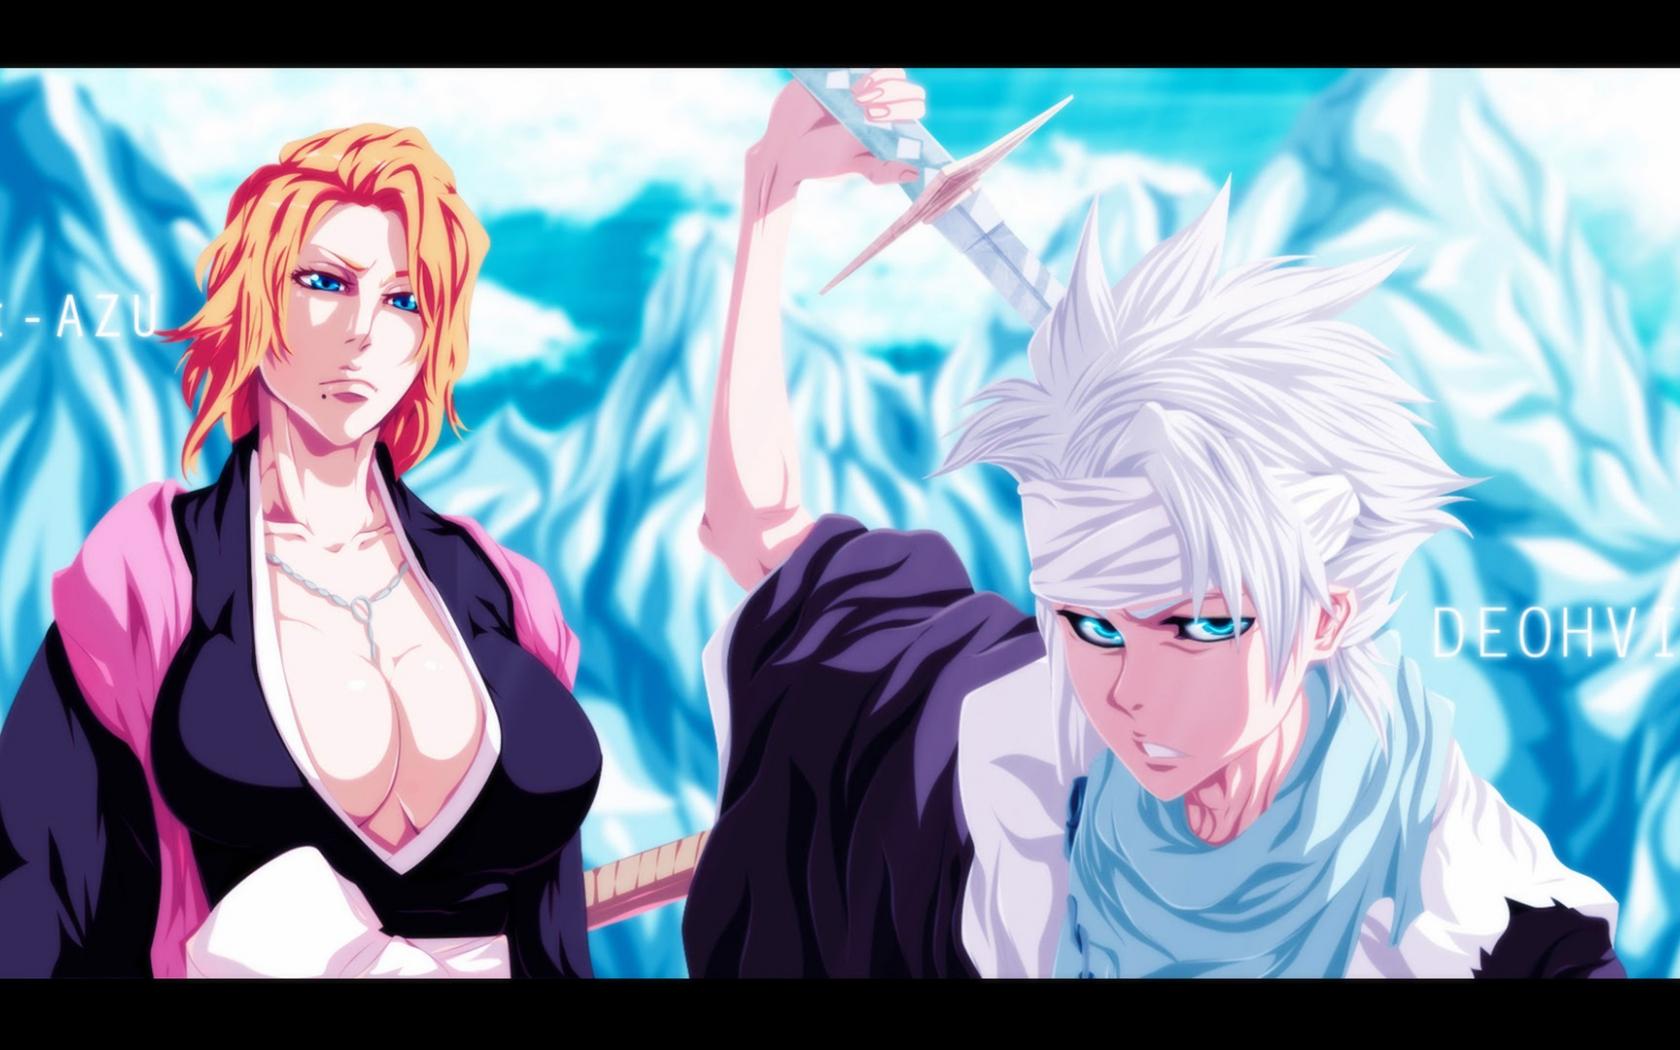 Free Download Toshiro Hitsugaya Rangiku Anime Bleach Hd Wallpaper